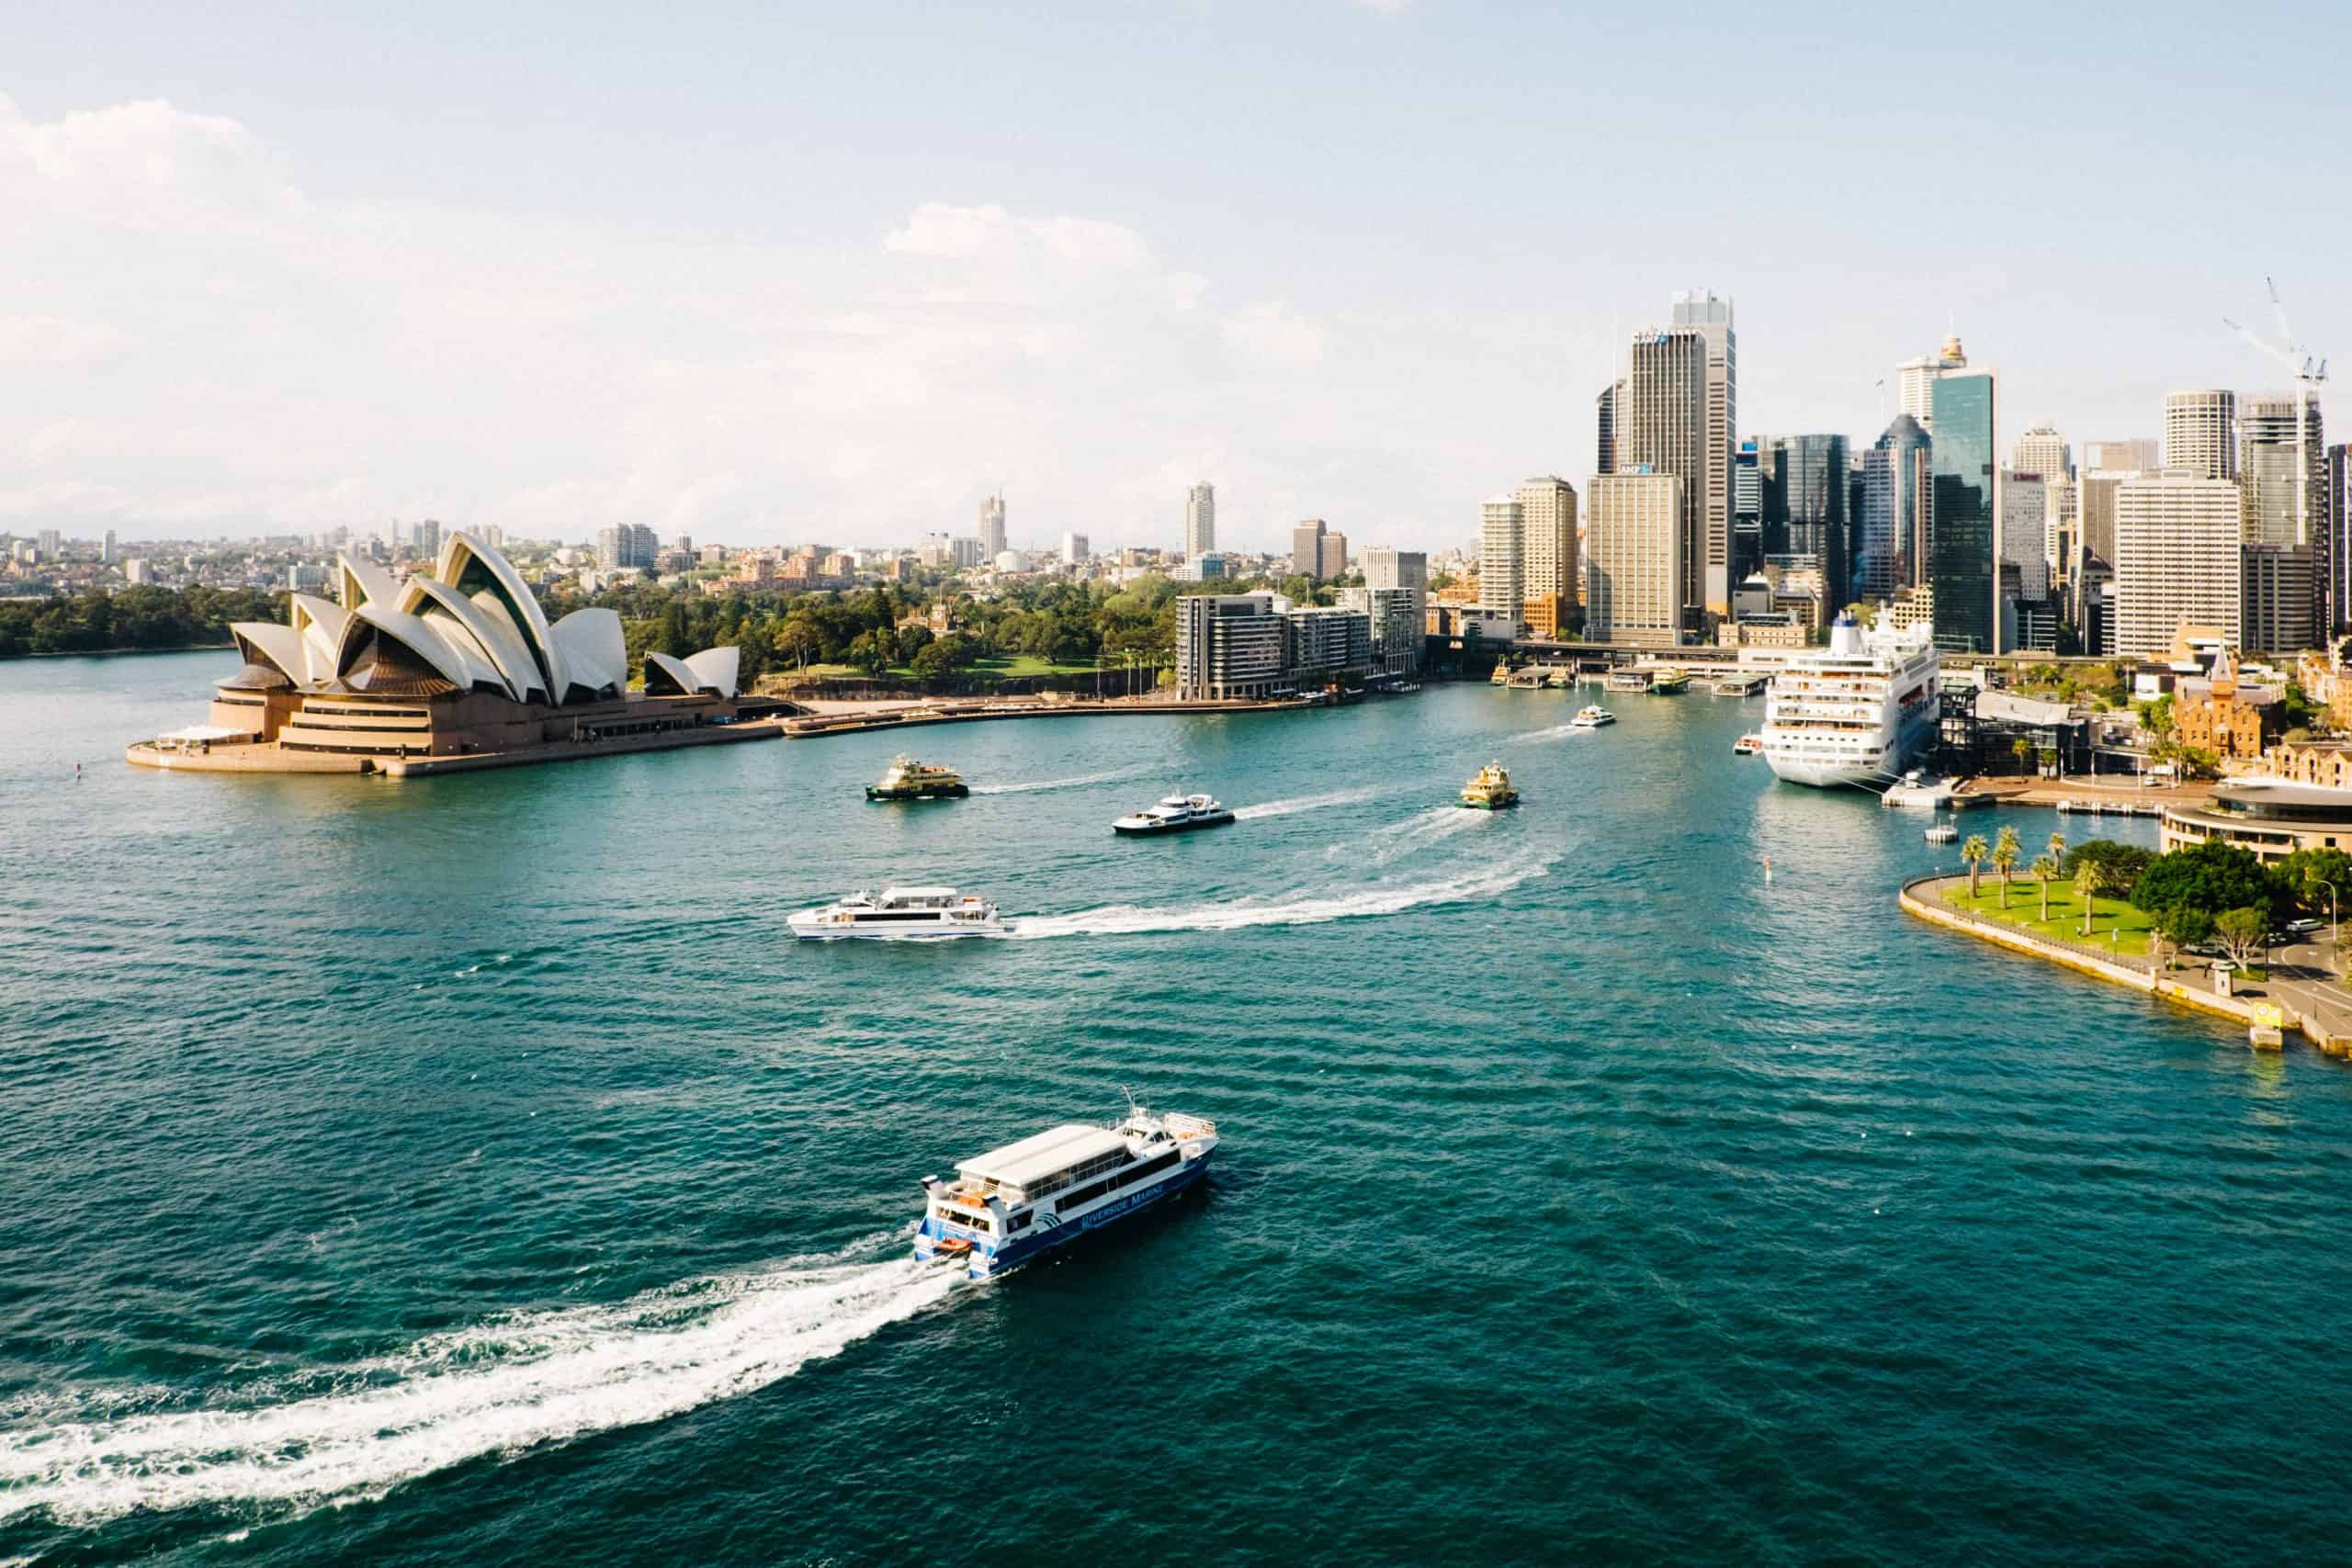 estudar em sydney austrália